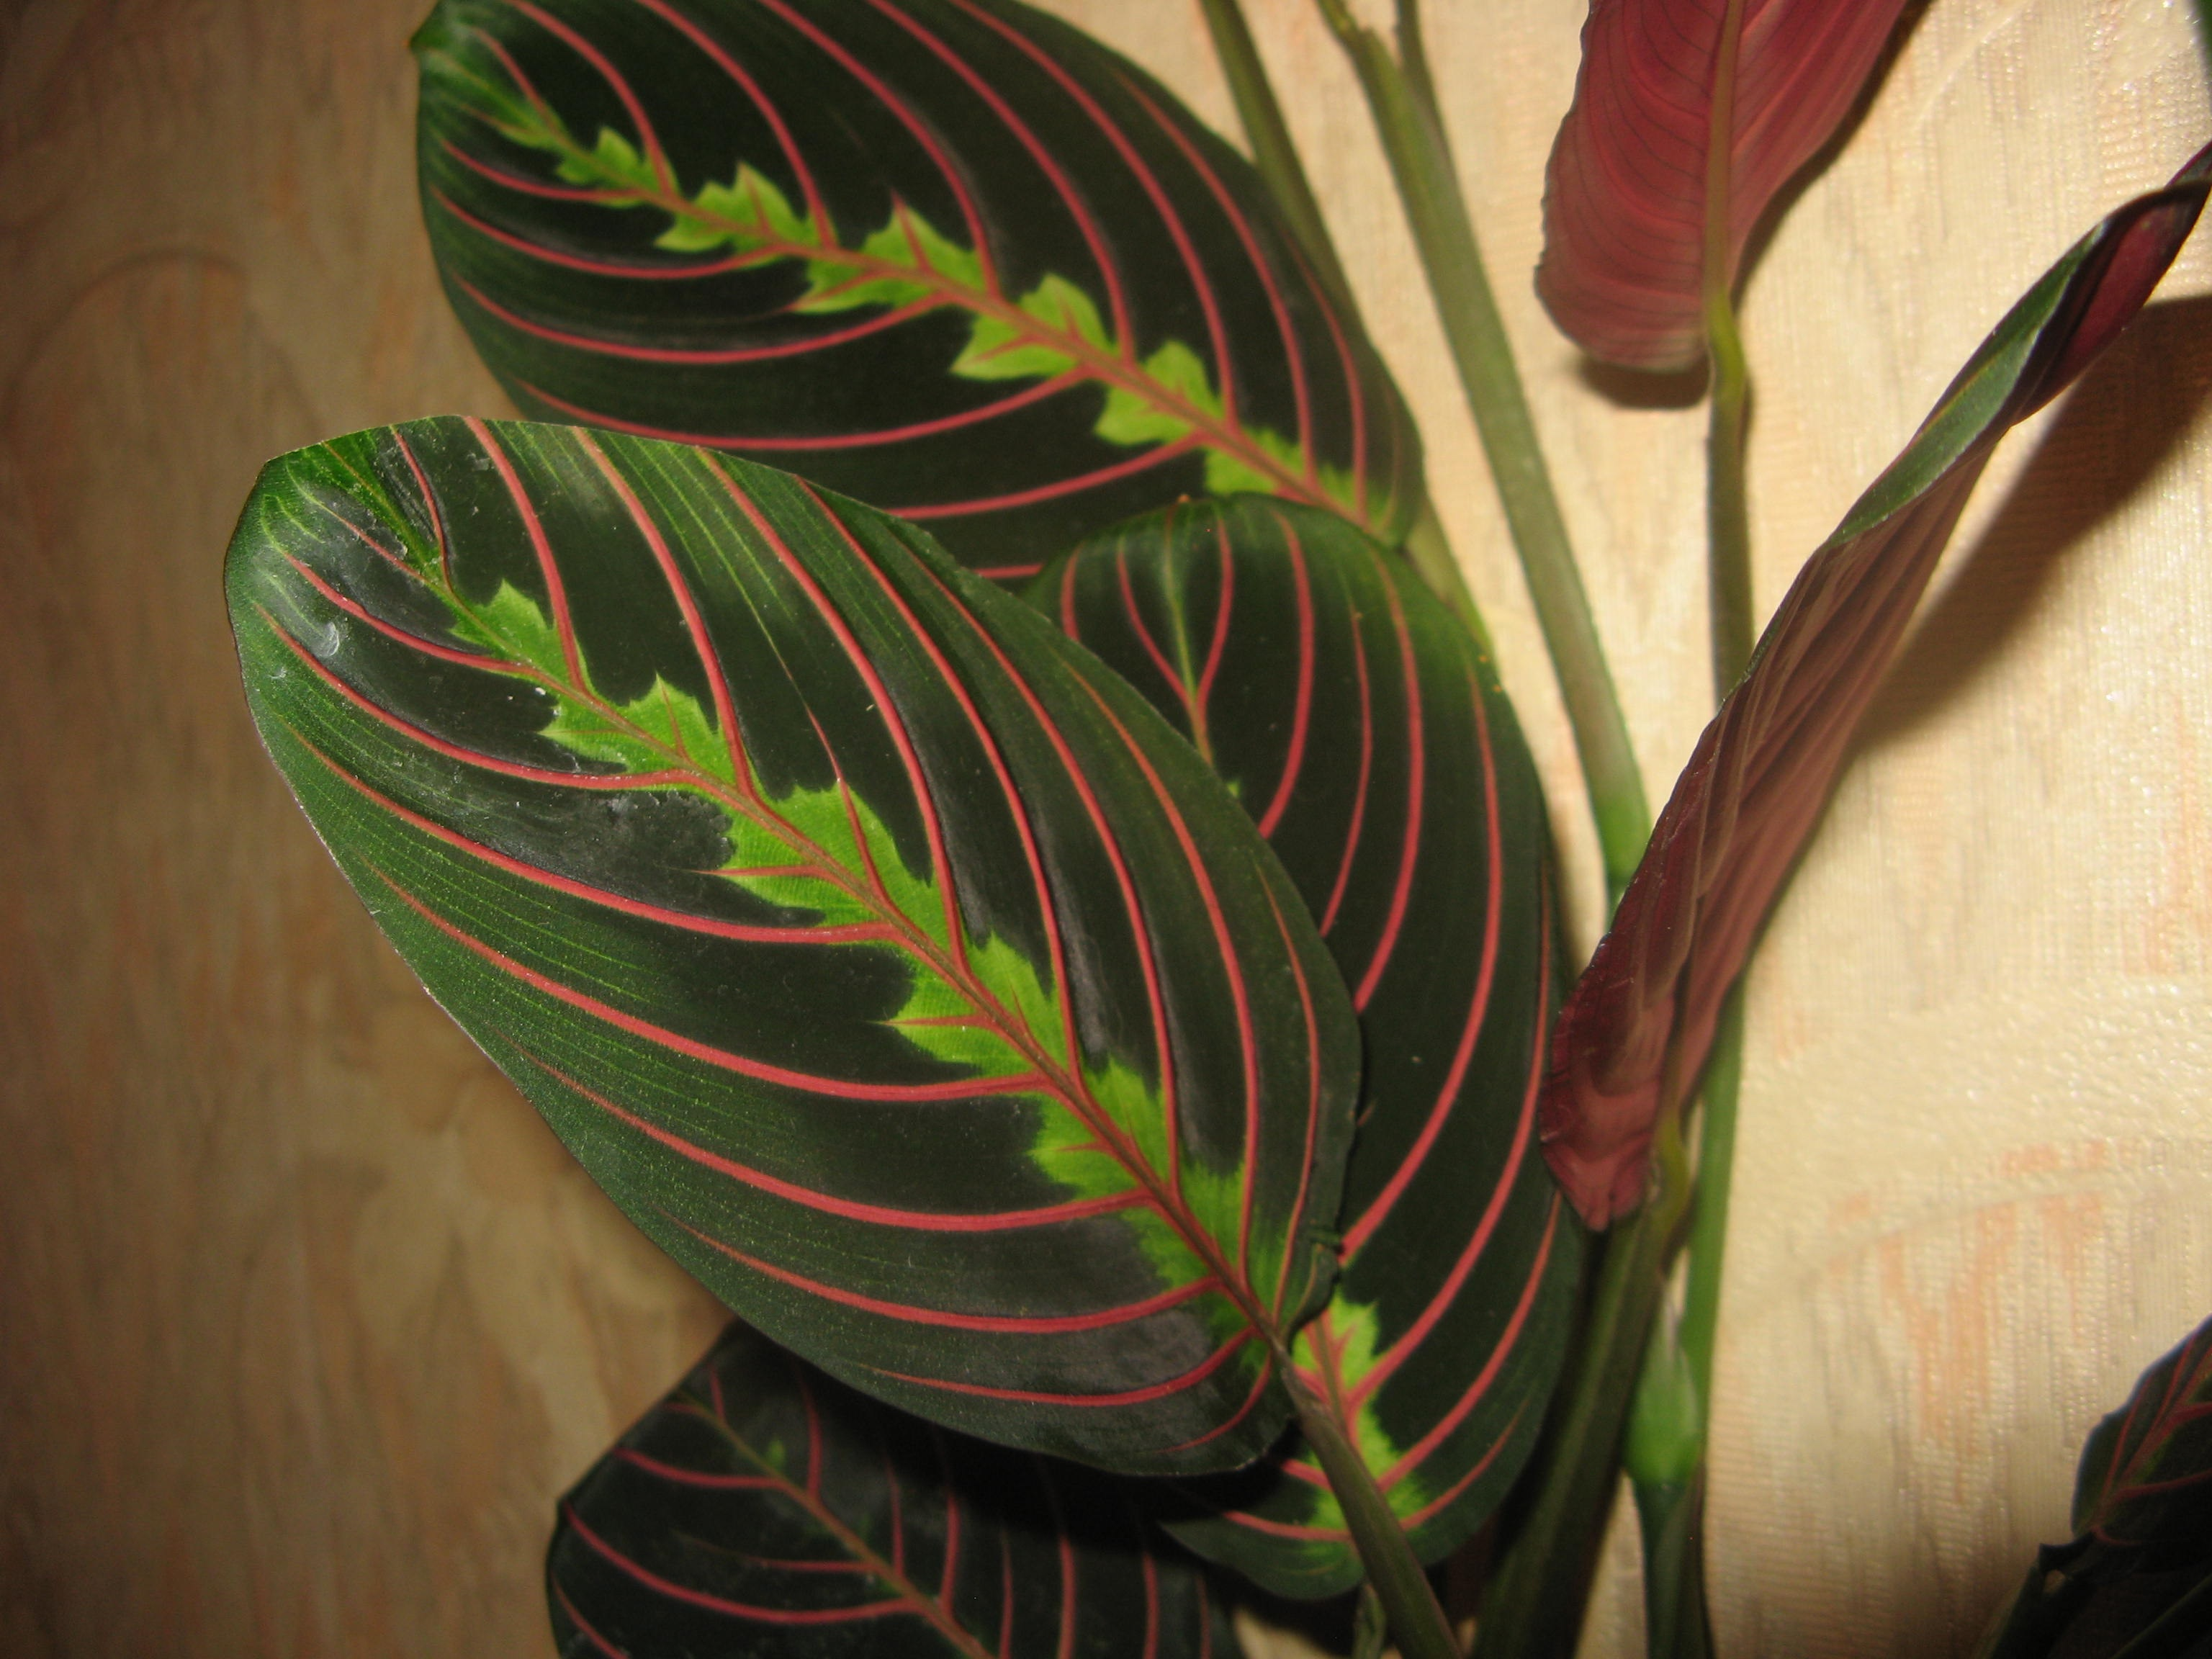 Сочетание светло-зеленого и темно-зеленого на листьях